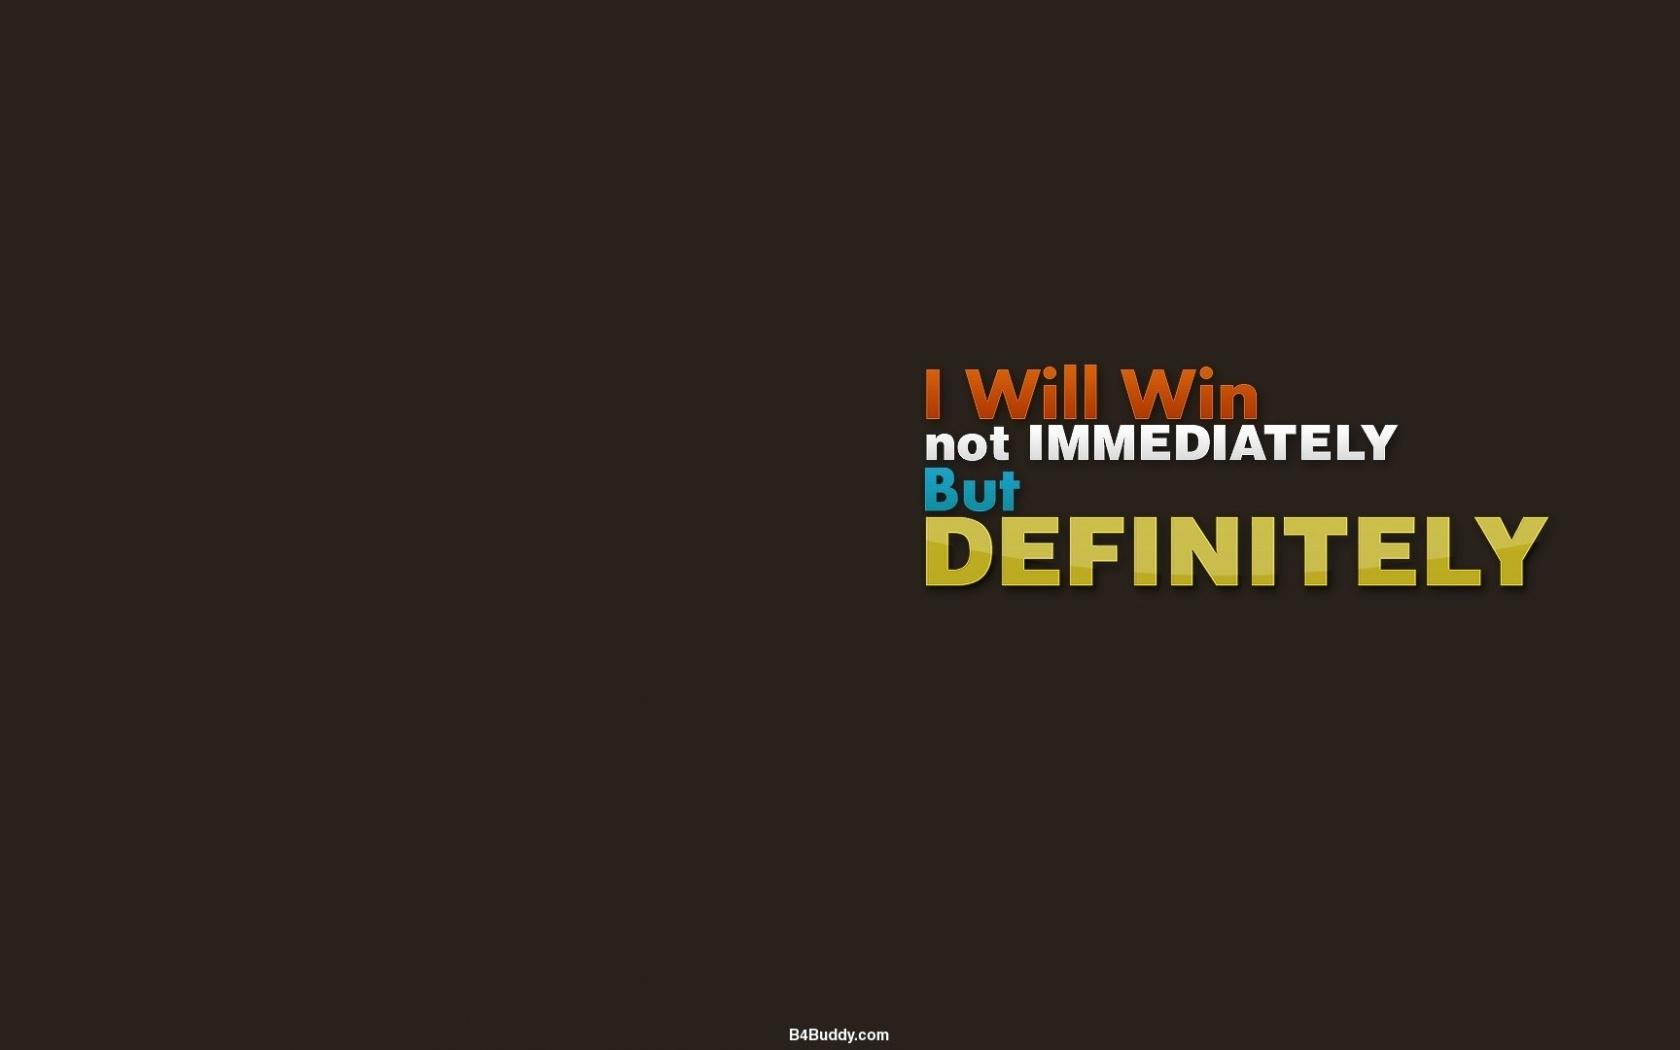 1680x1050 Motivational Quote Wallpaper desktop PC and Mac wallpaper 1680x1050